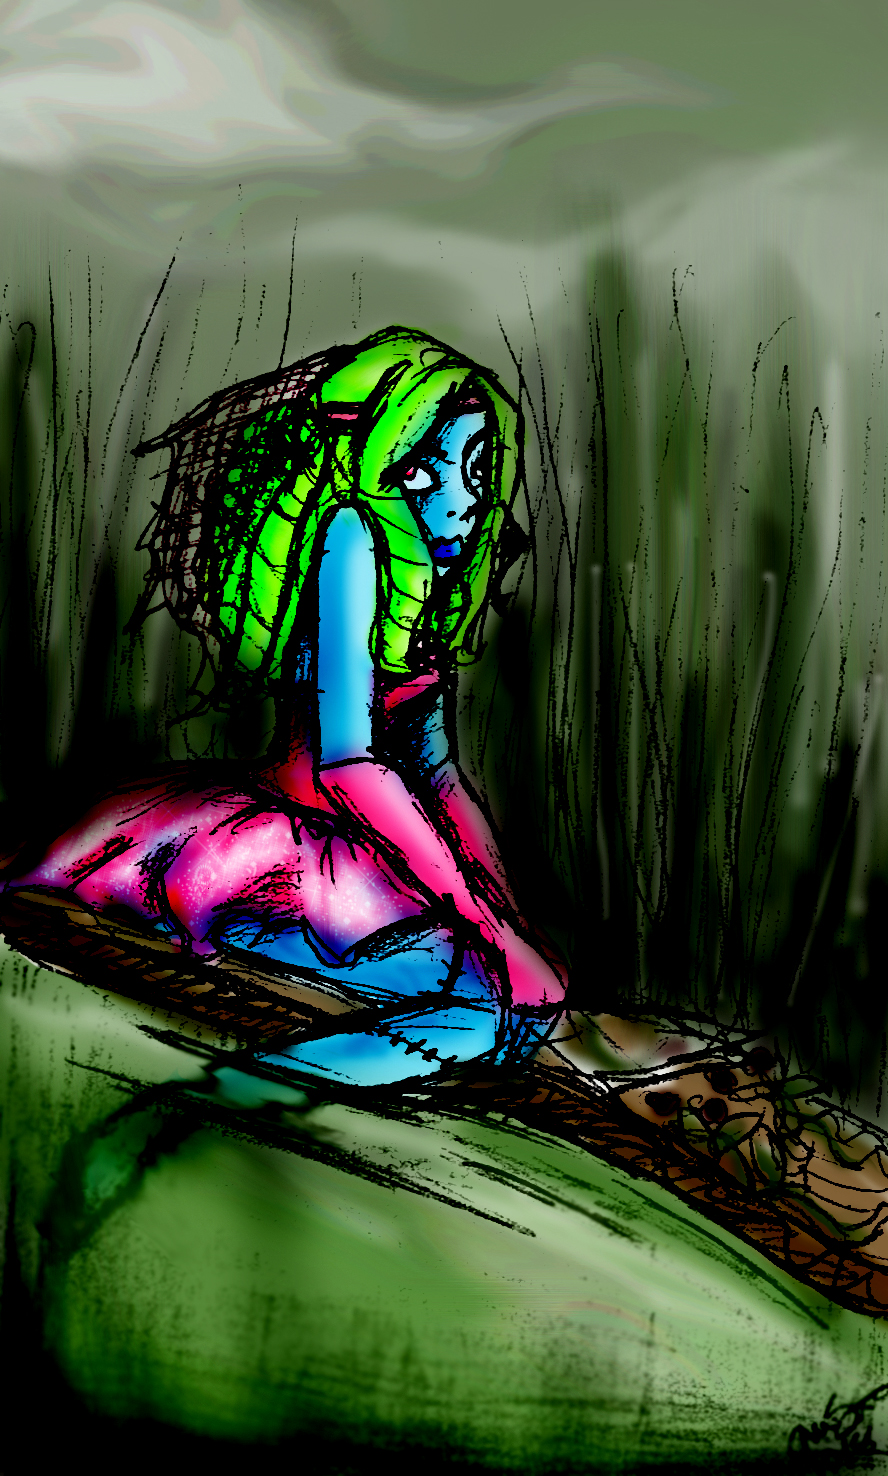 She's a Swamp princess!